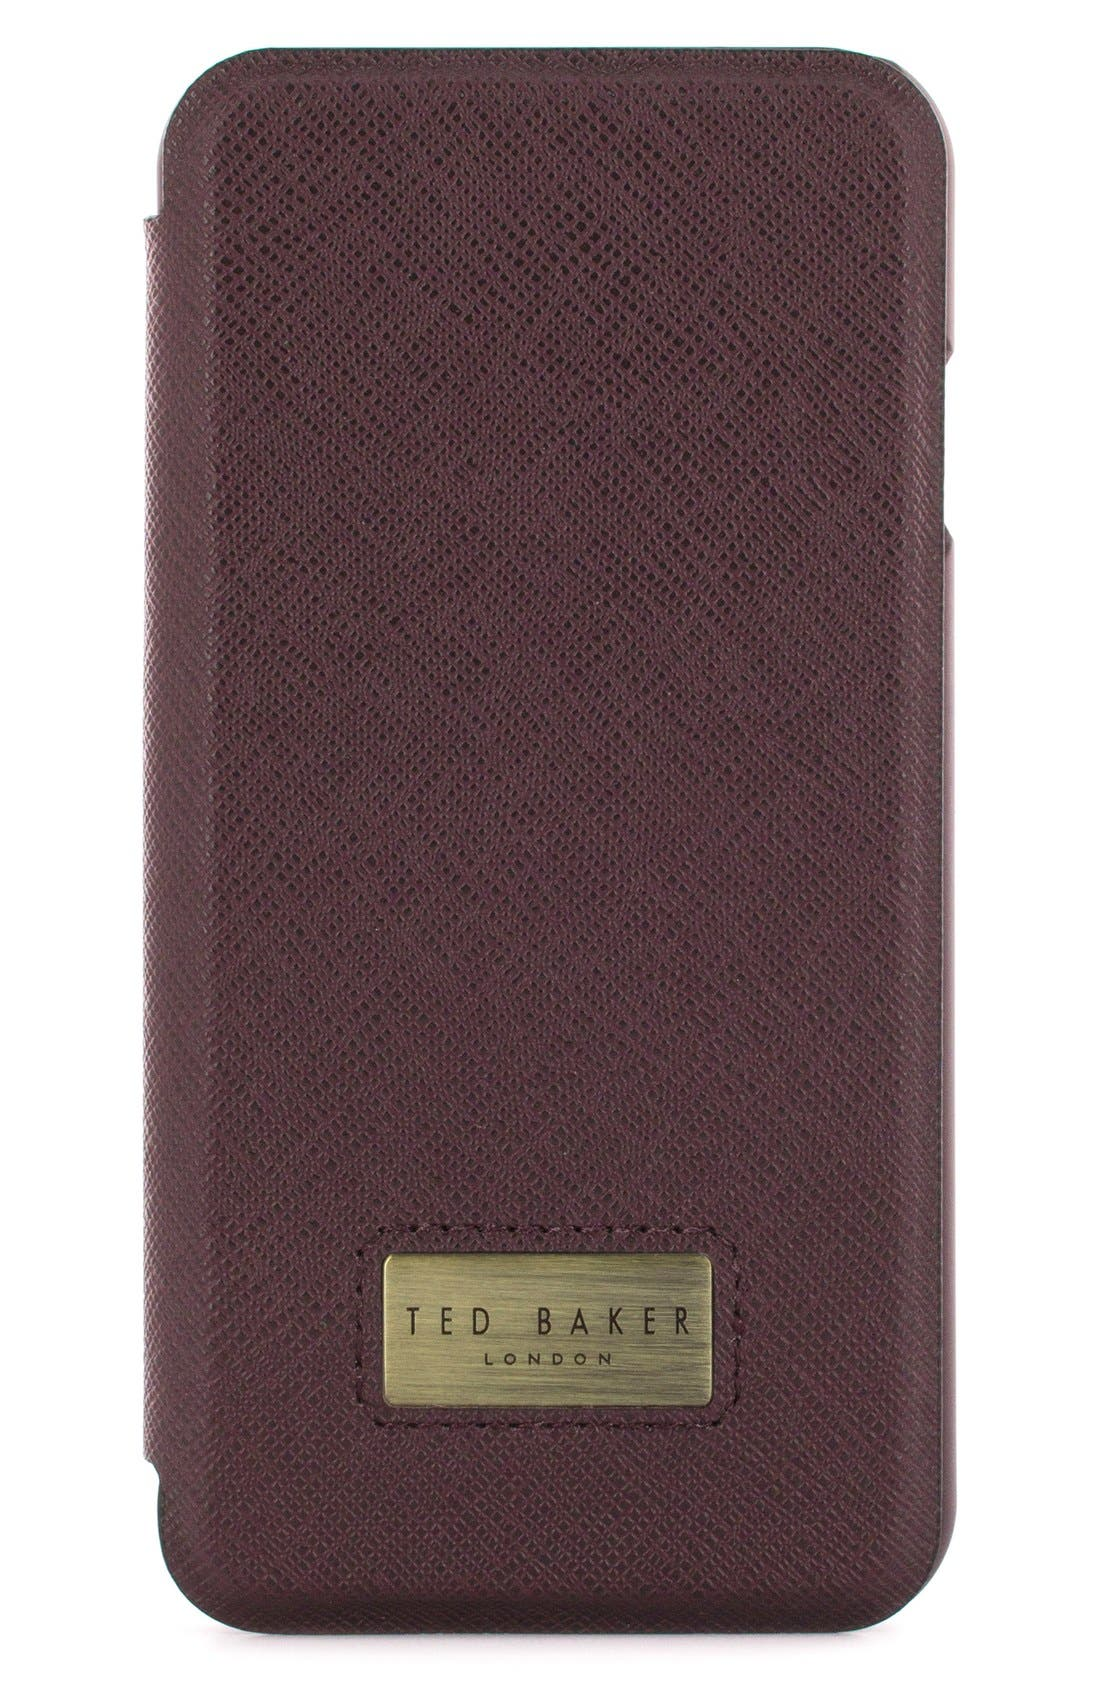 Ted Baker London Aries iPhone 7 Folio